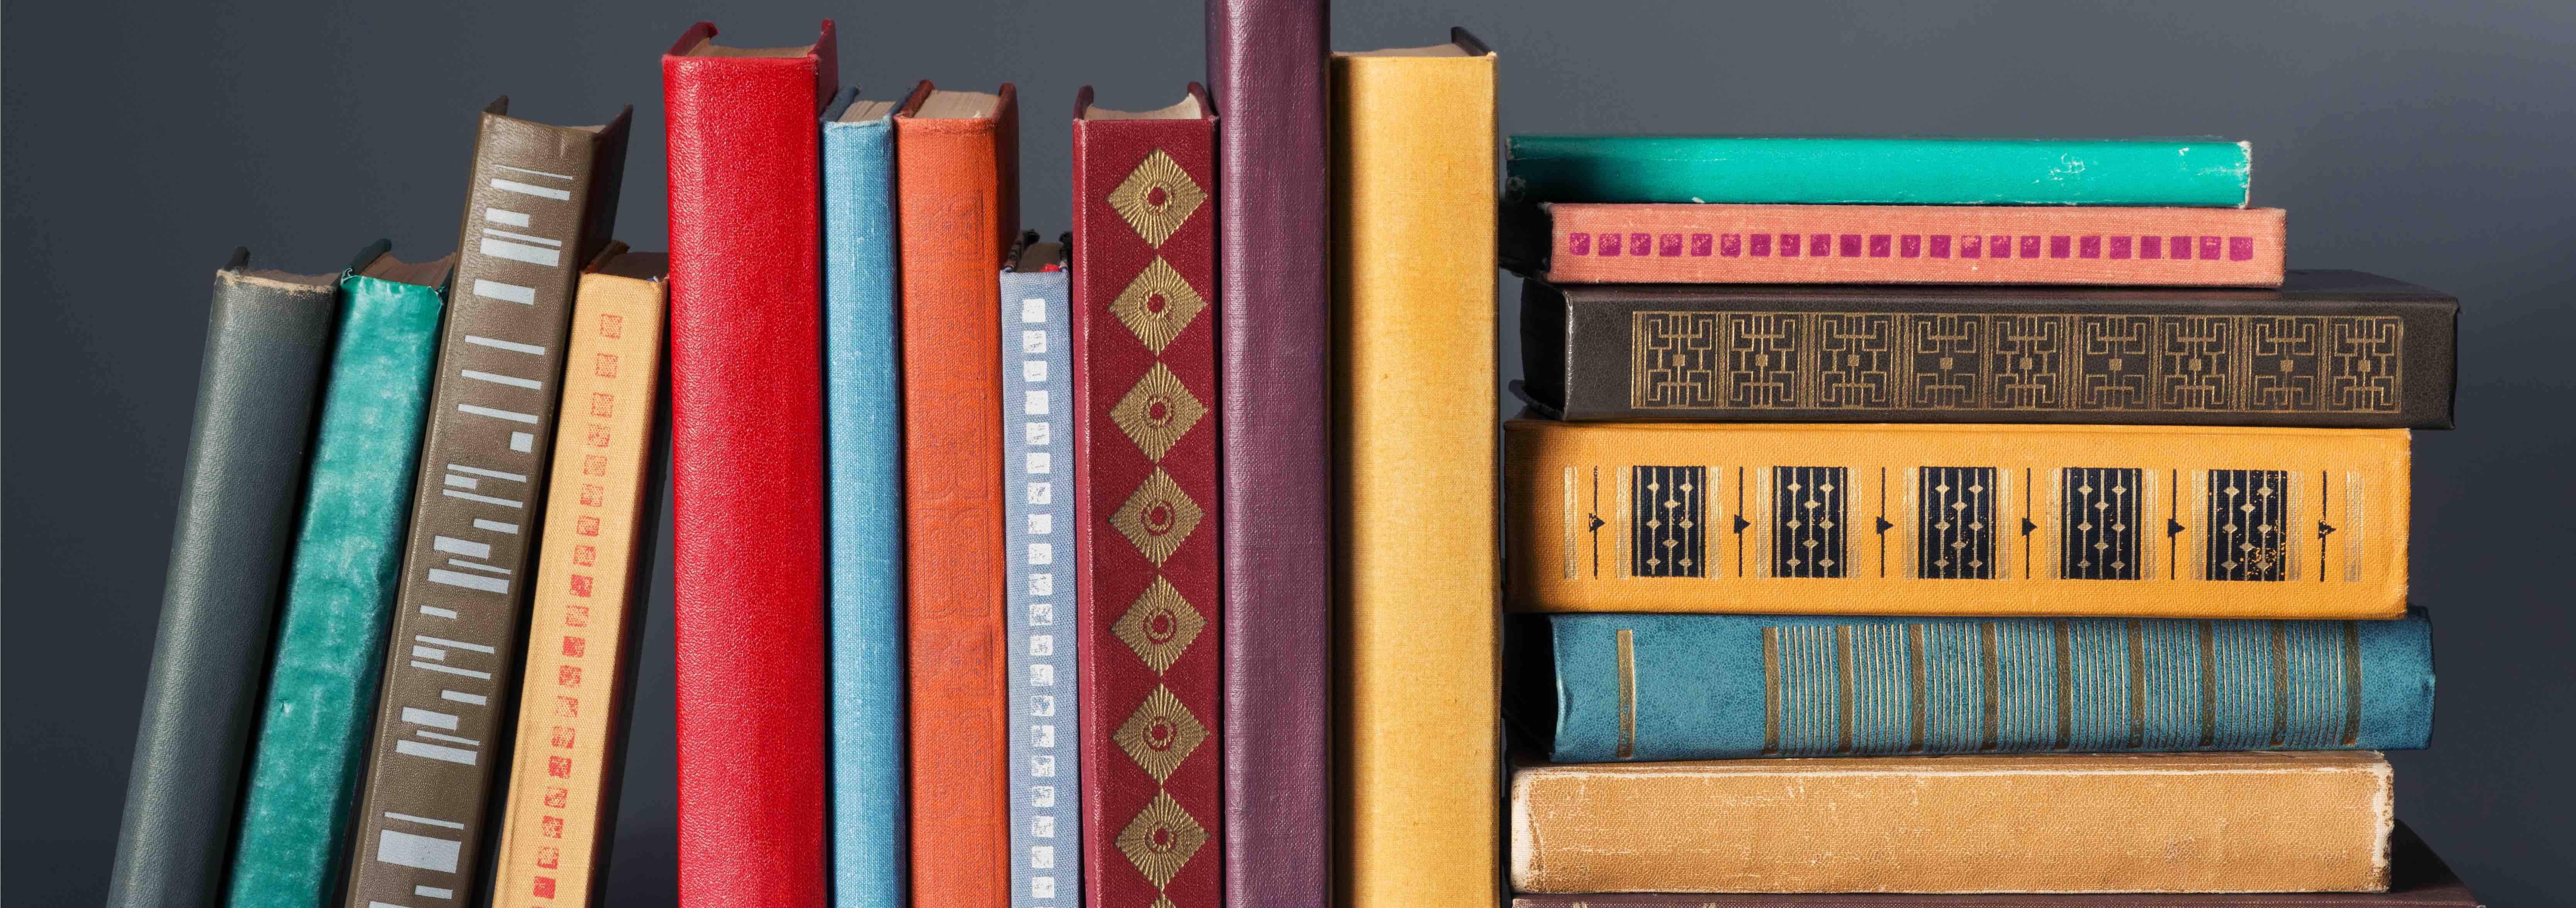 bookshelf-organization